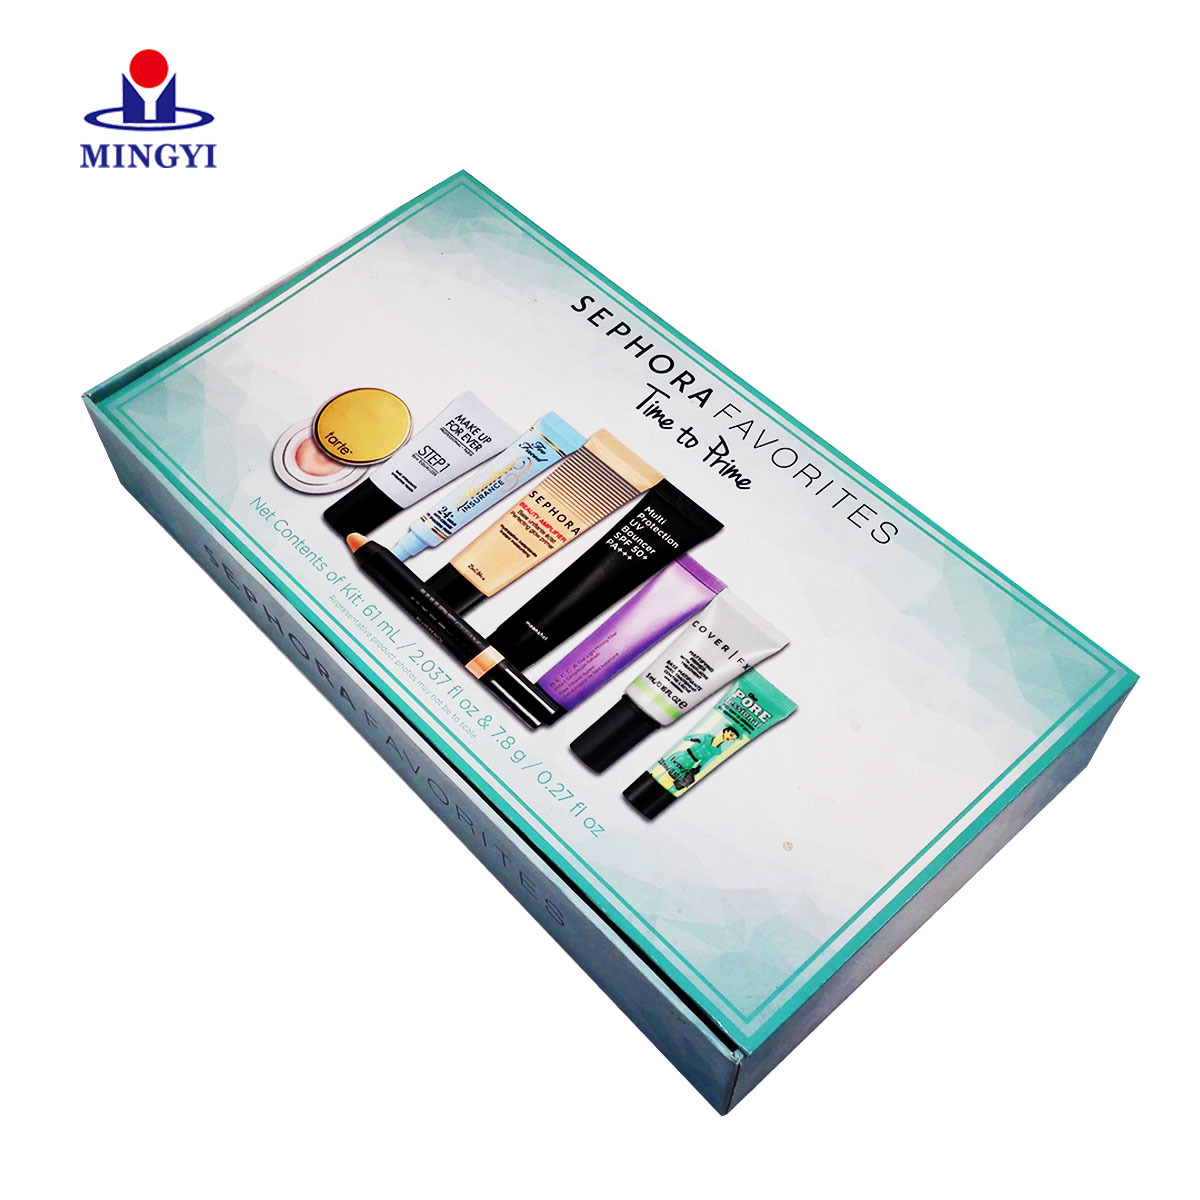 products watch gift box watch Mingyi Printing company